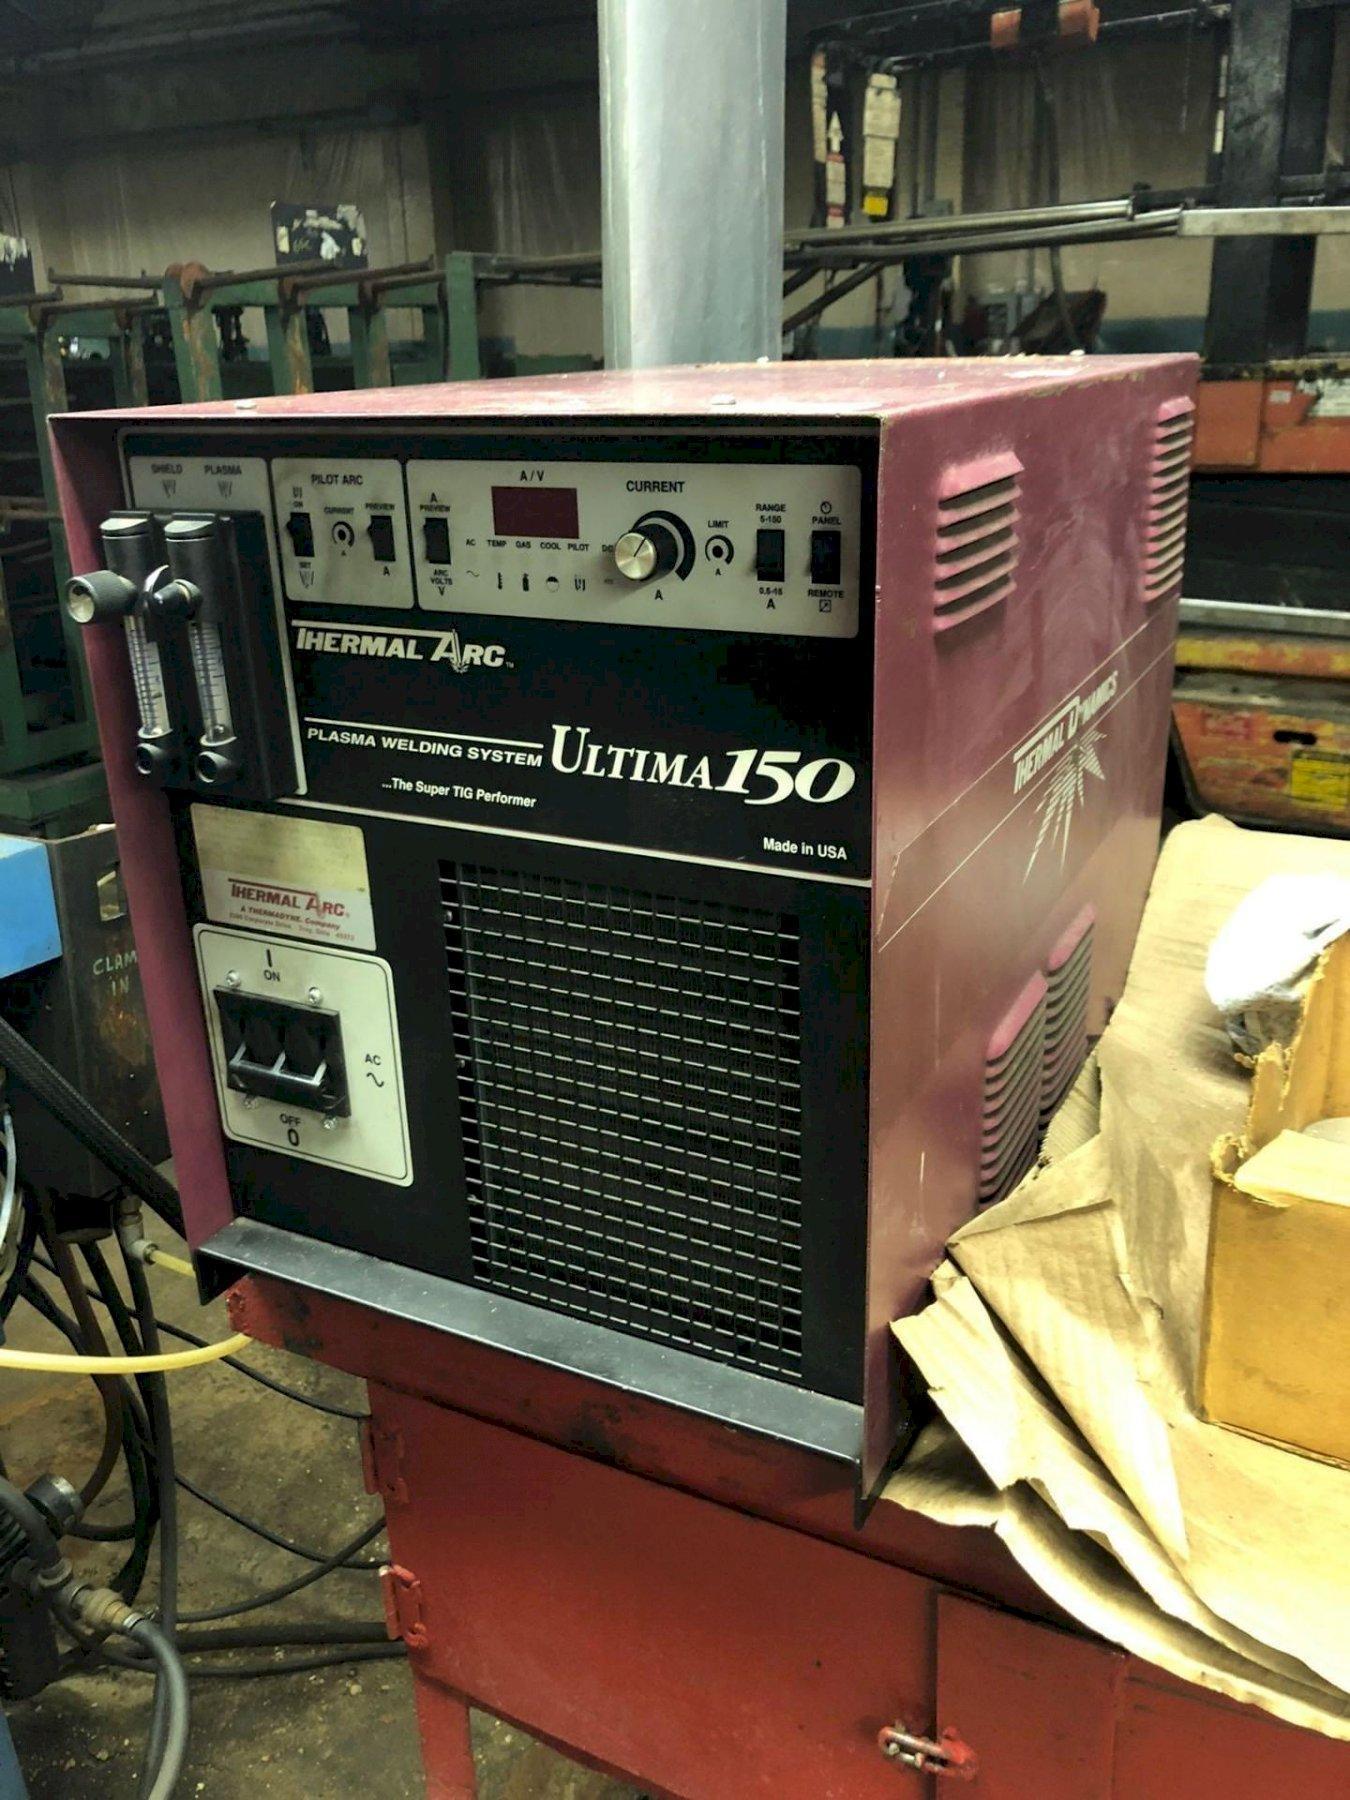 Thermal Arc Ultima 150 Plasma Welding System